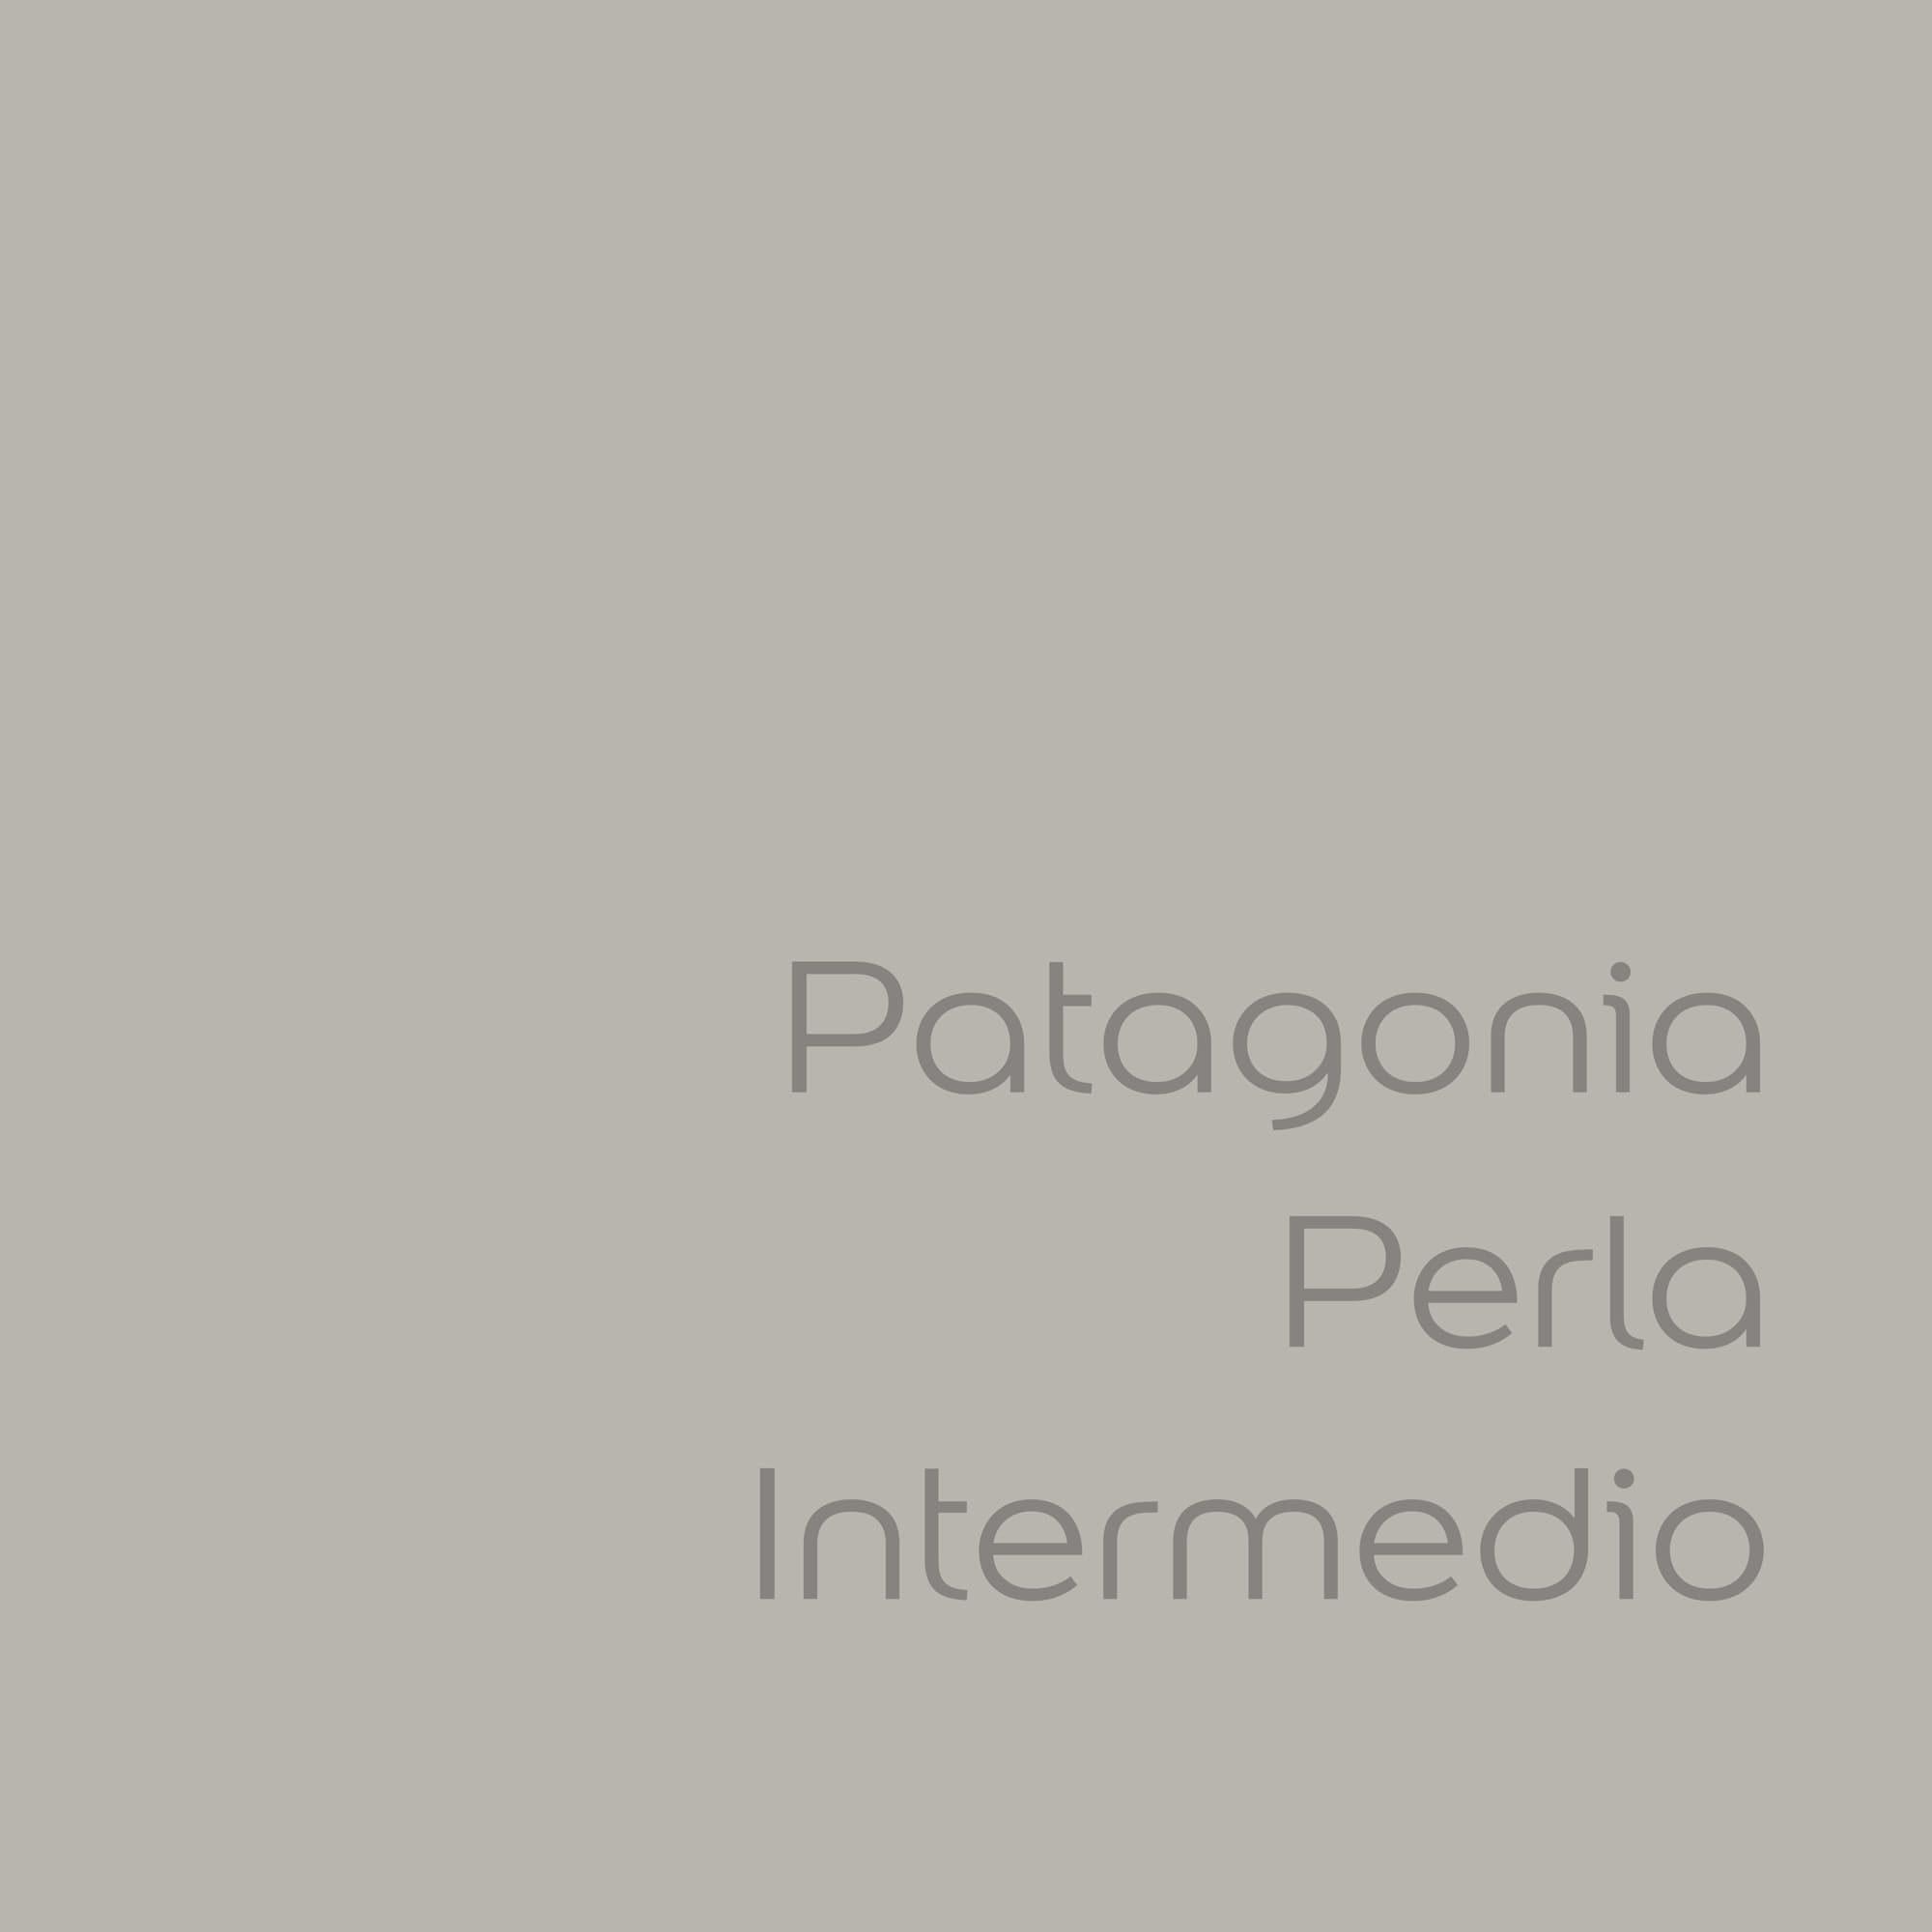 tester de color de pintura bruguer cdm patagonia perla intermedio color